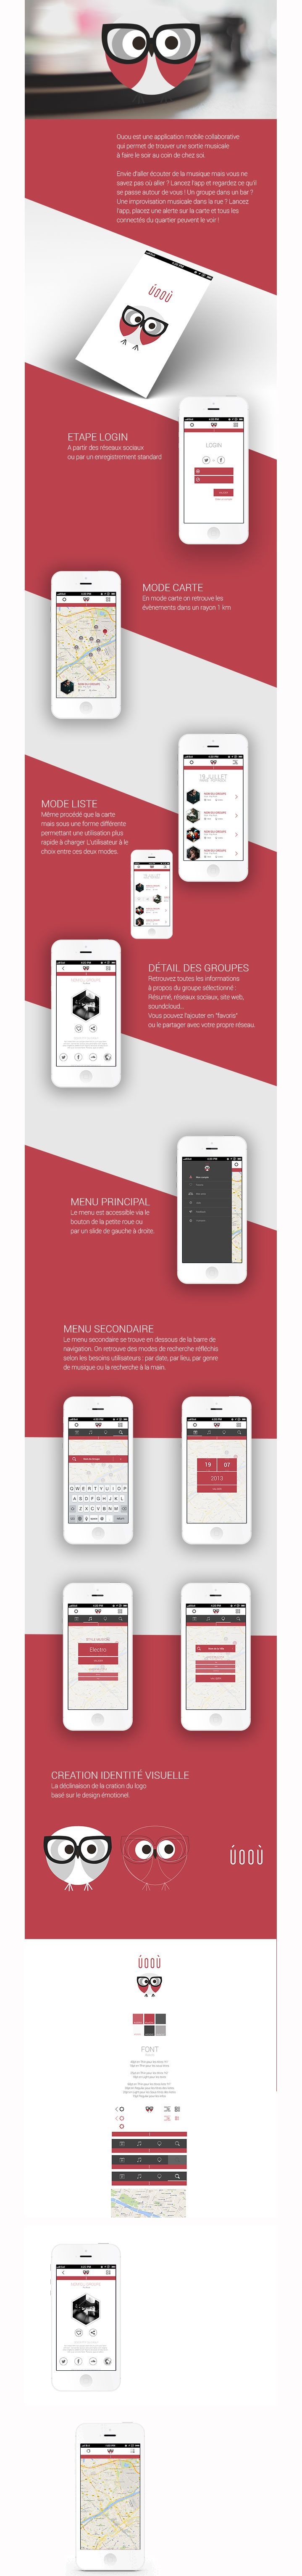 Mobile app design – nice colours and i love the owl logo. #mobile #webdesign #la…